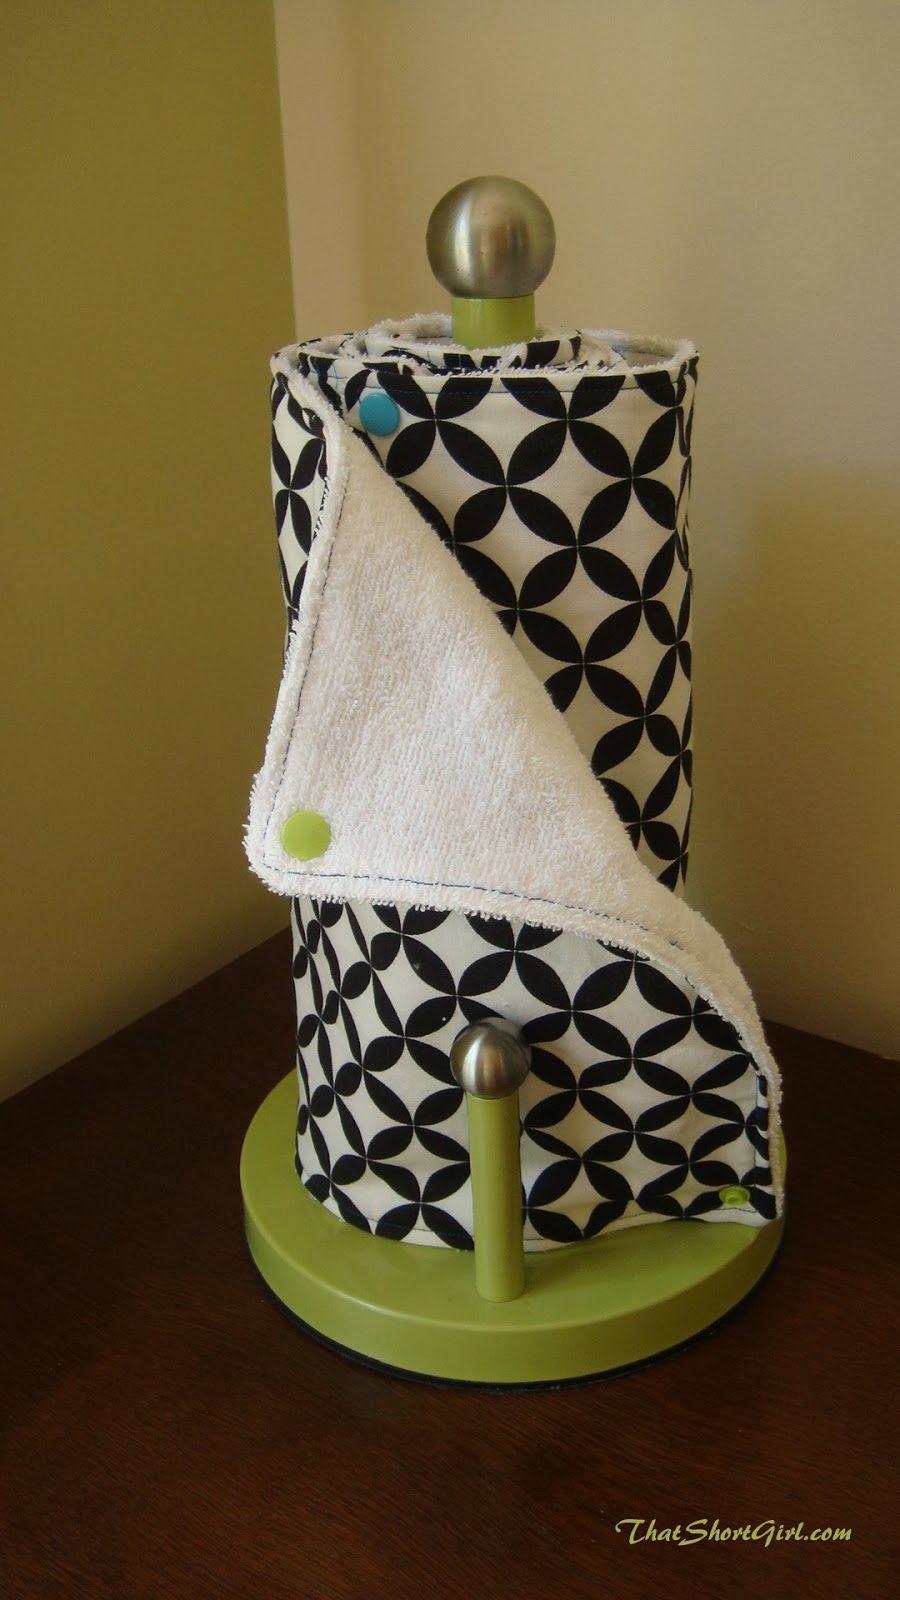 Reusable Paper Towel Tutorial Reusable Paper Towels Tutorial Reusable Paper Towels Paper Towel